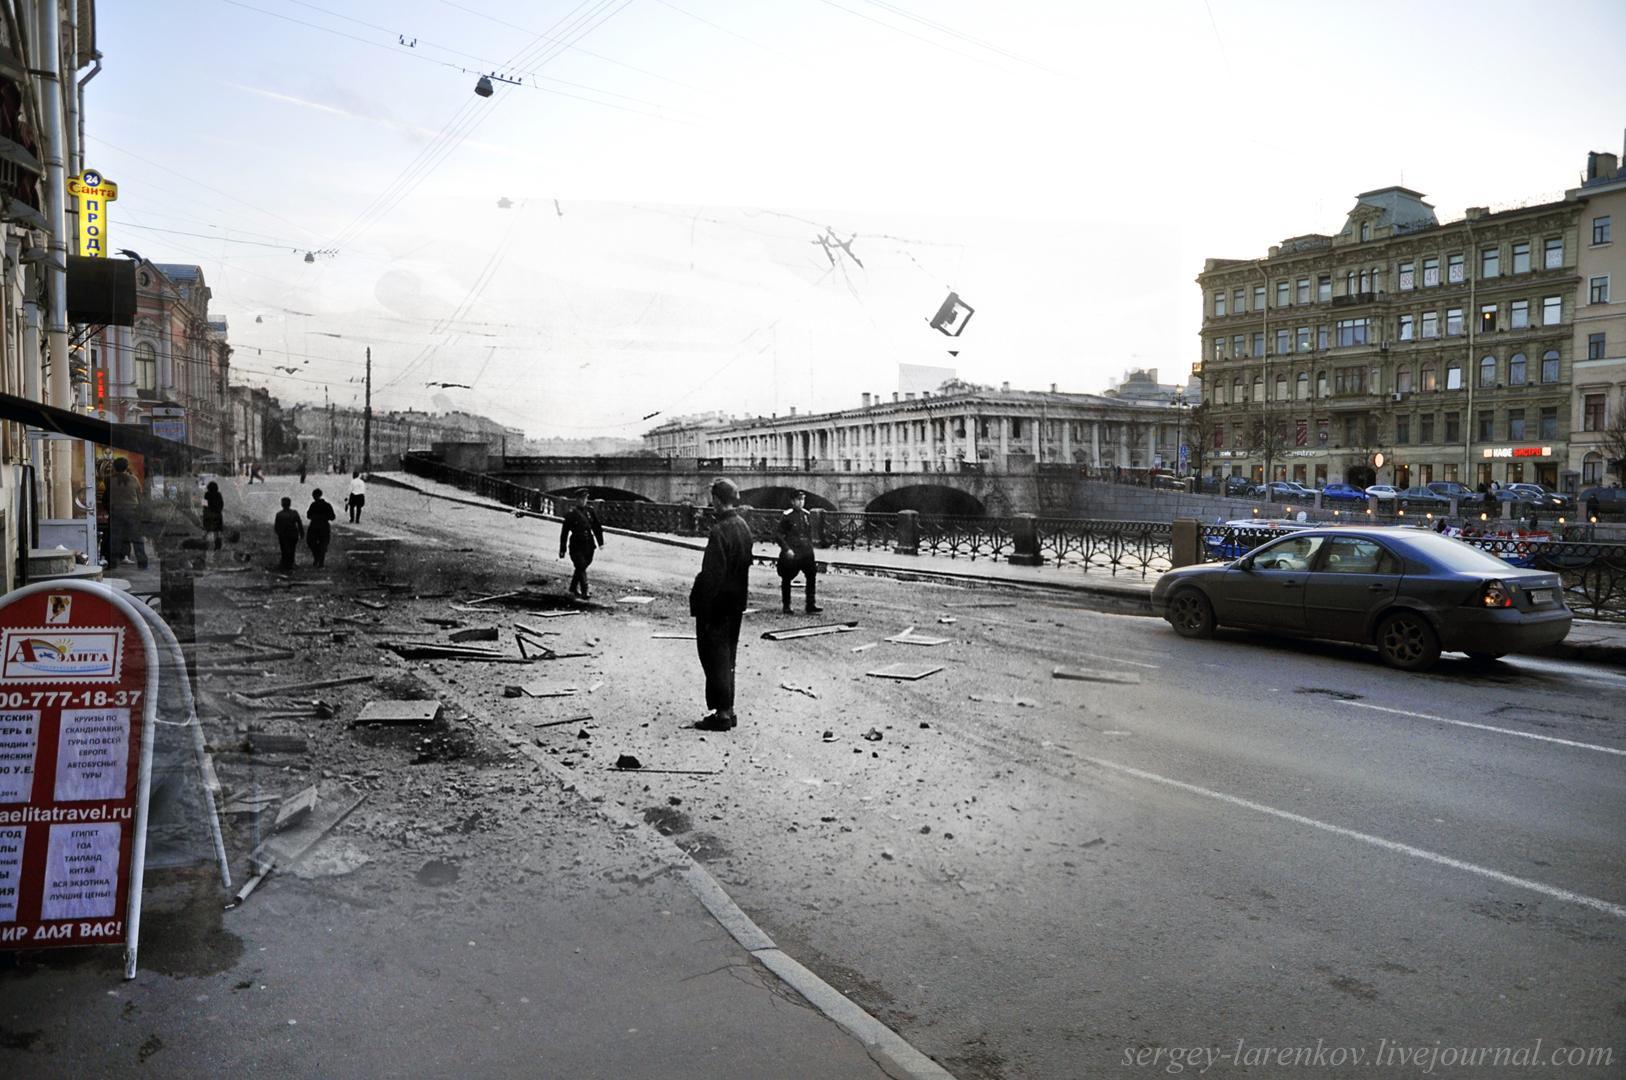 281. Ленинград 1941-2013 Фонтанка